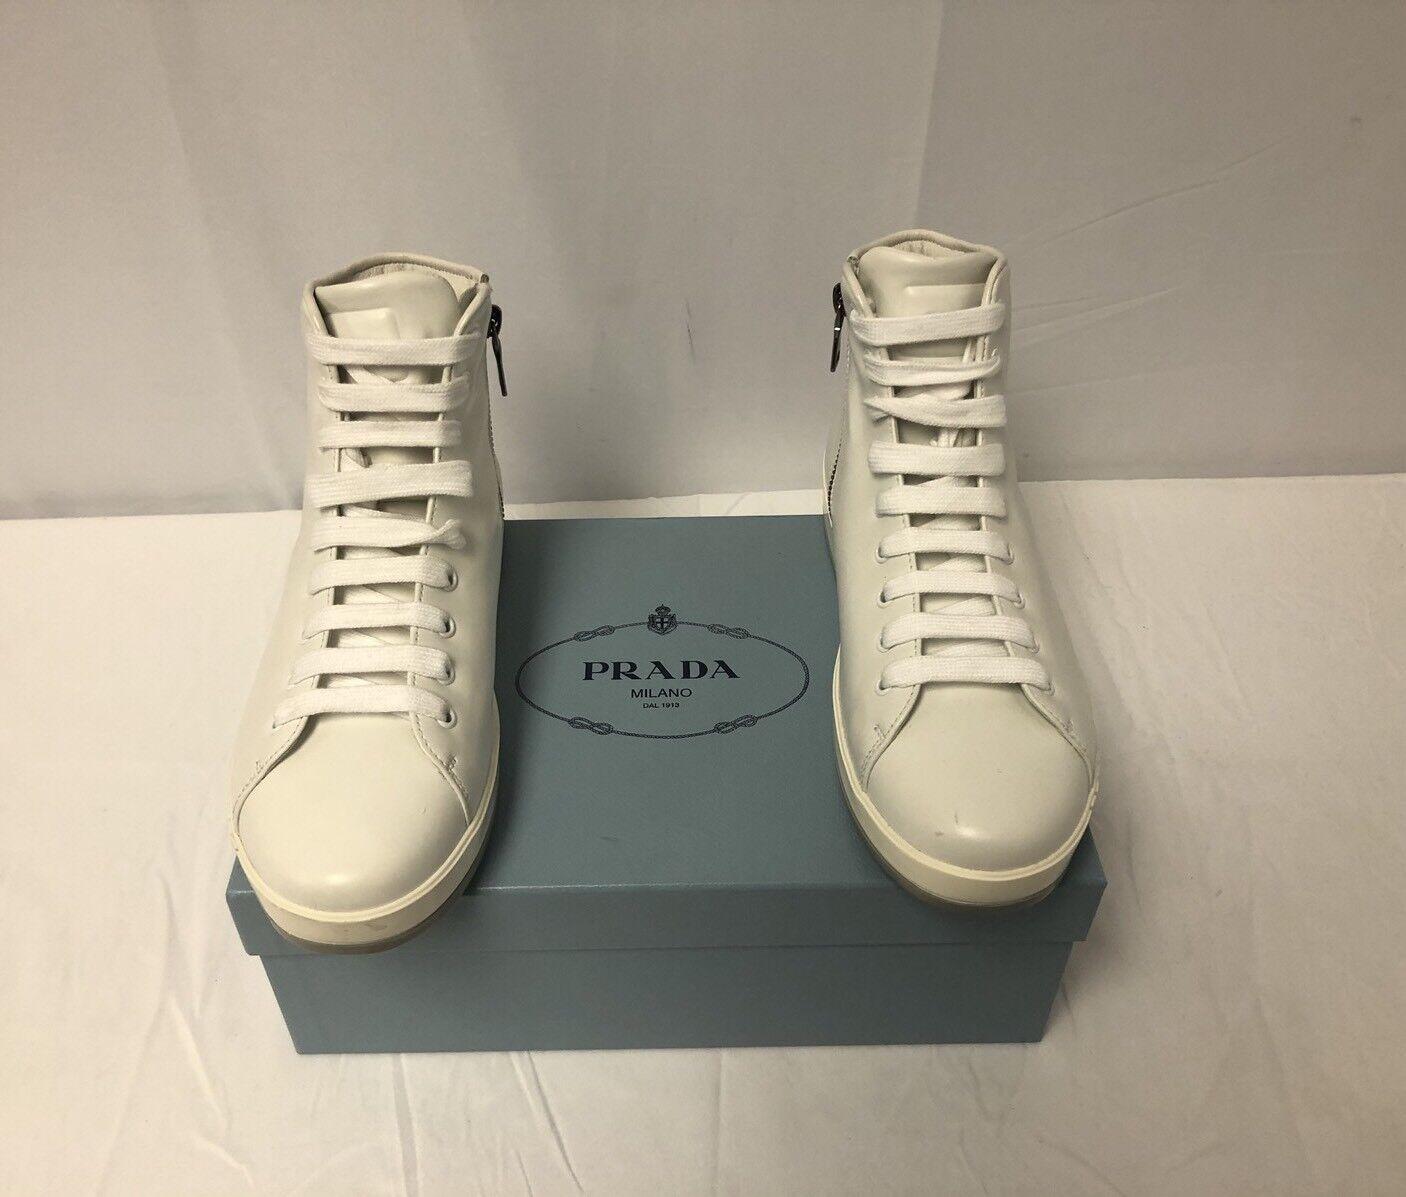 New In Box Prada Optic Weiß Leather High-Top Turnschuhe Größe 39.5 9US  695.00